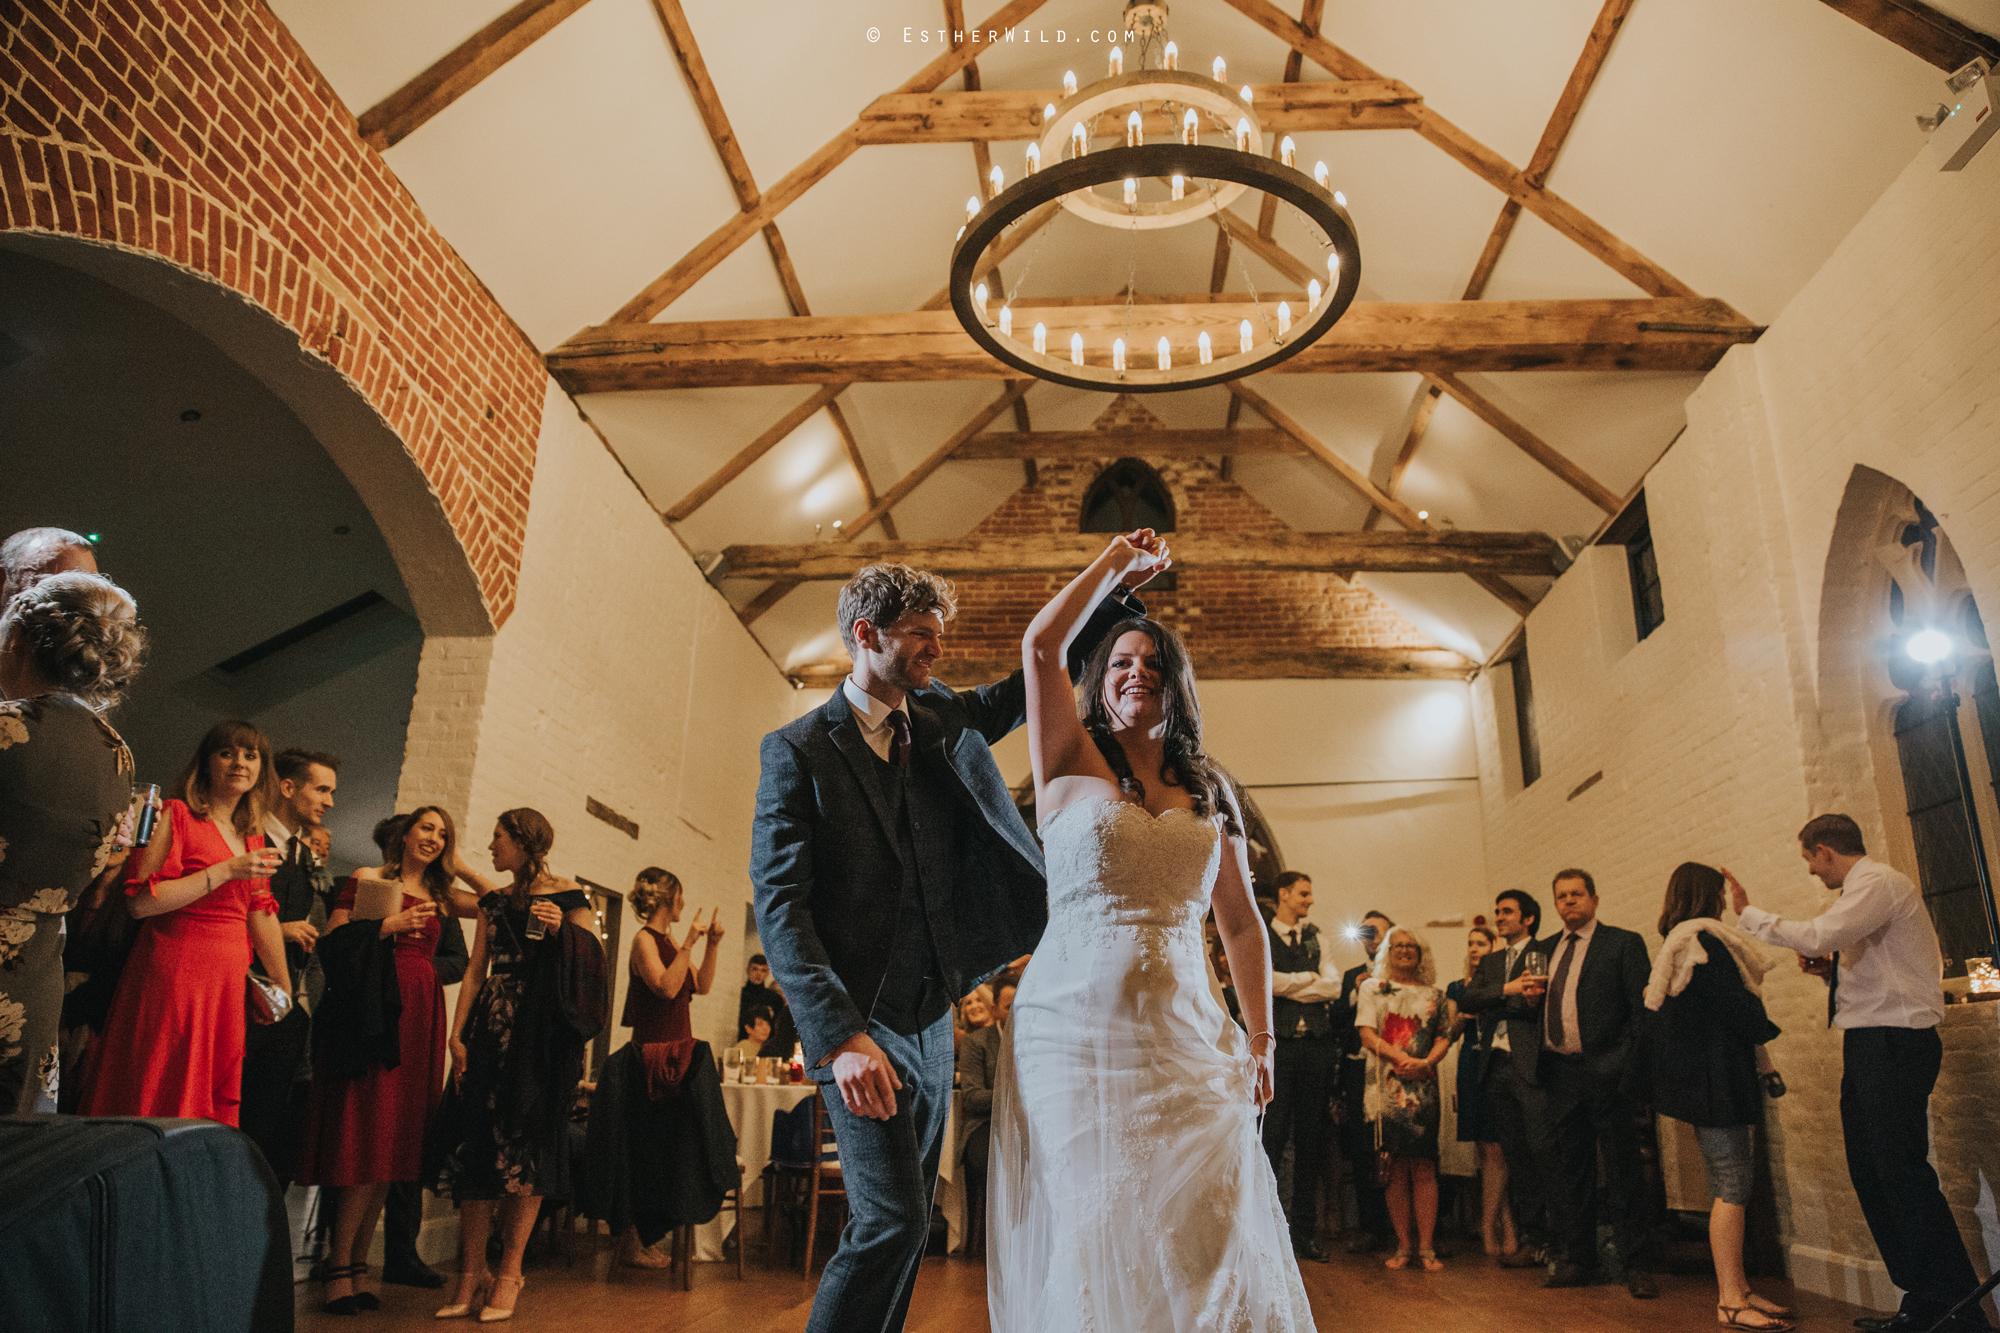 Reading_Room_Weddings_Alby_Norwich_Photographer_Esther_Wild_IMG_3506.jpg